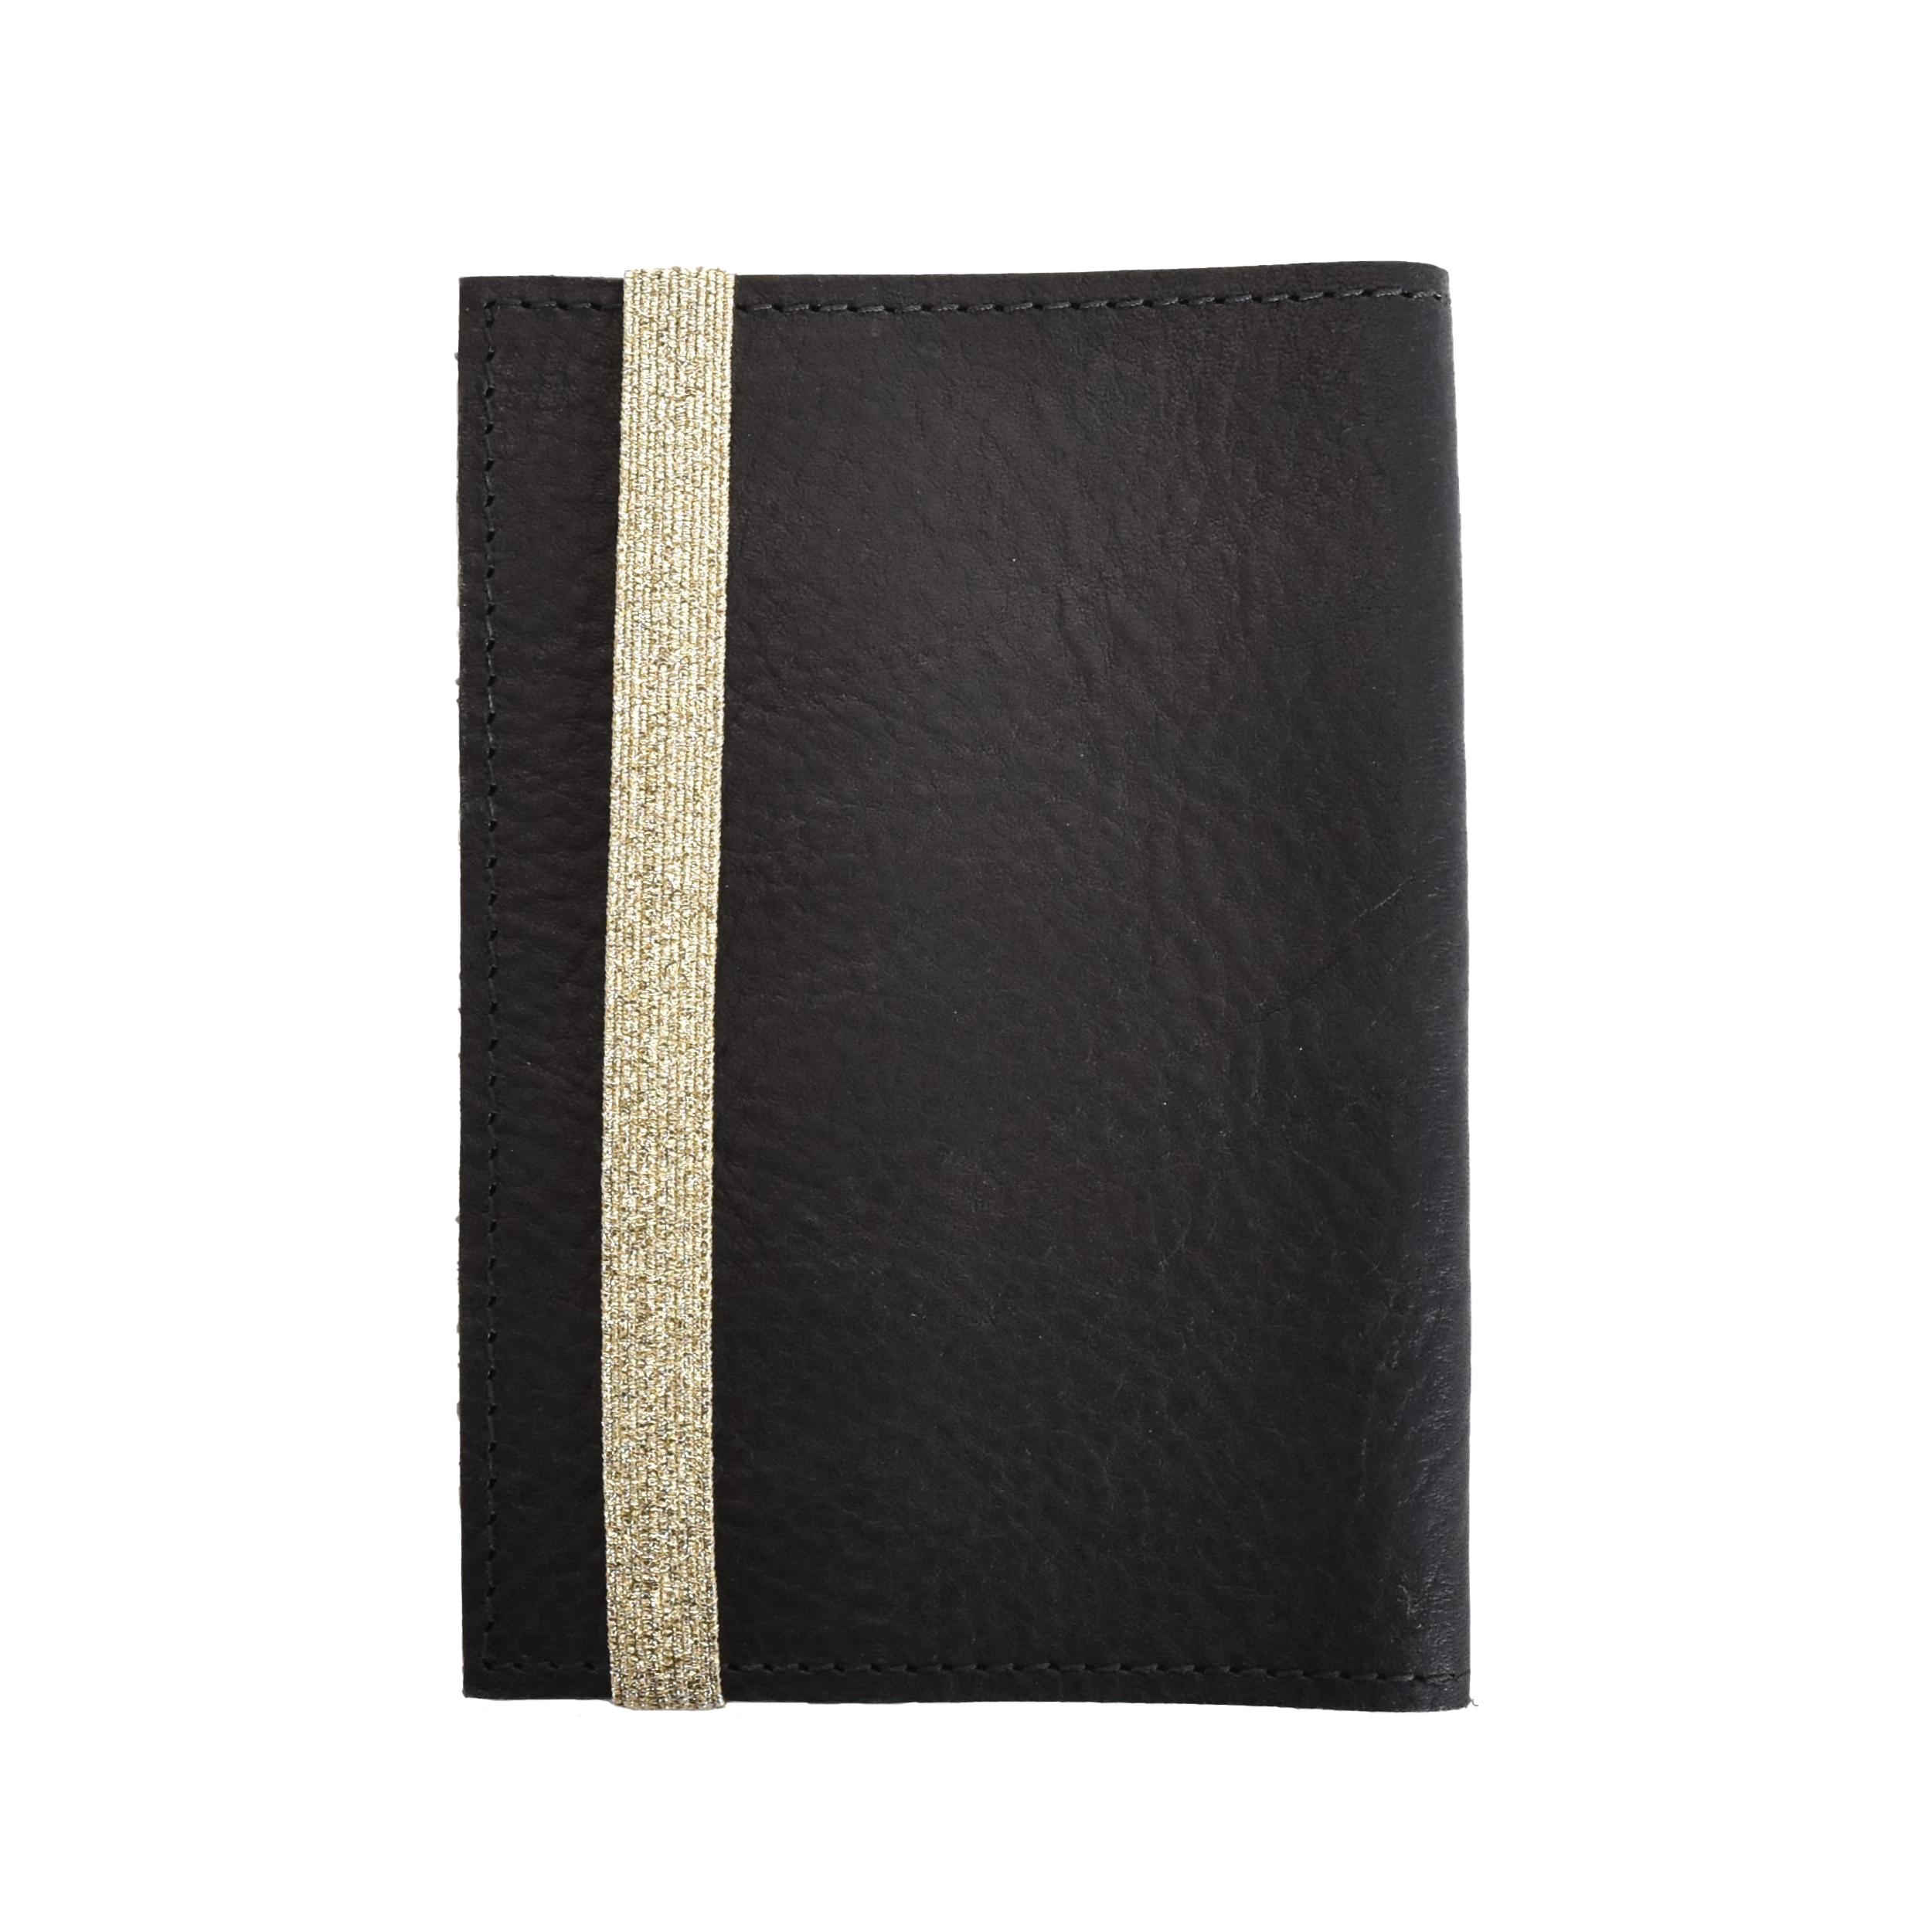 Passeport noir 2